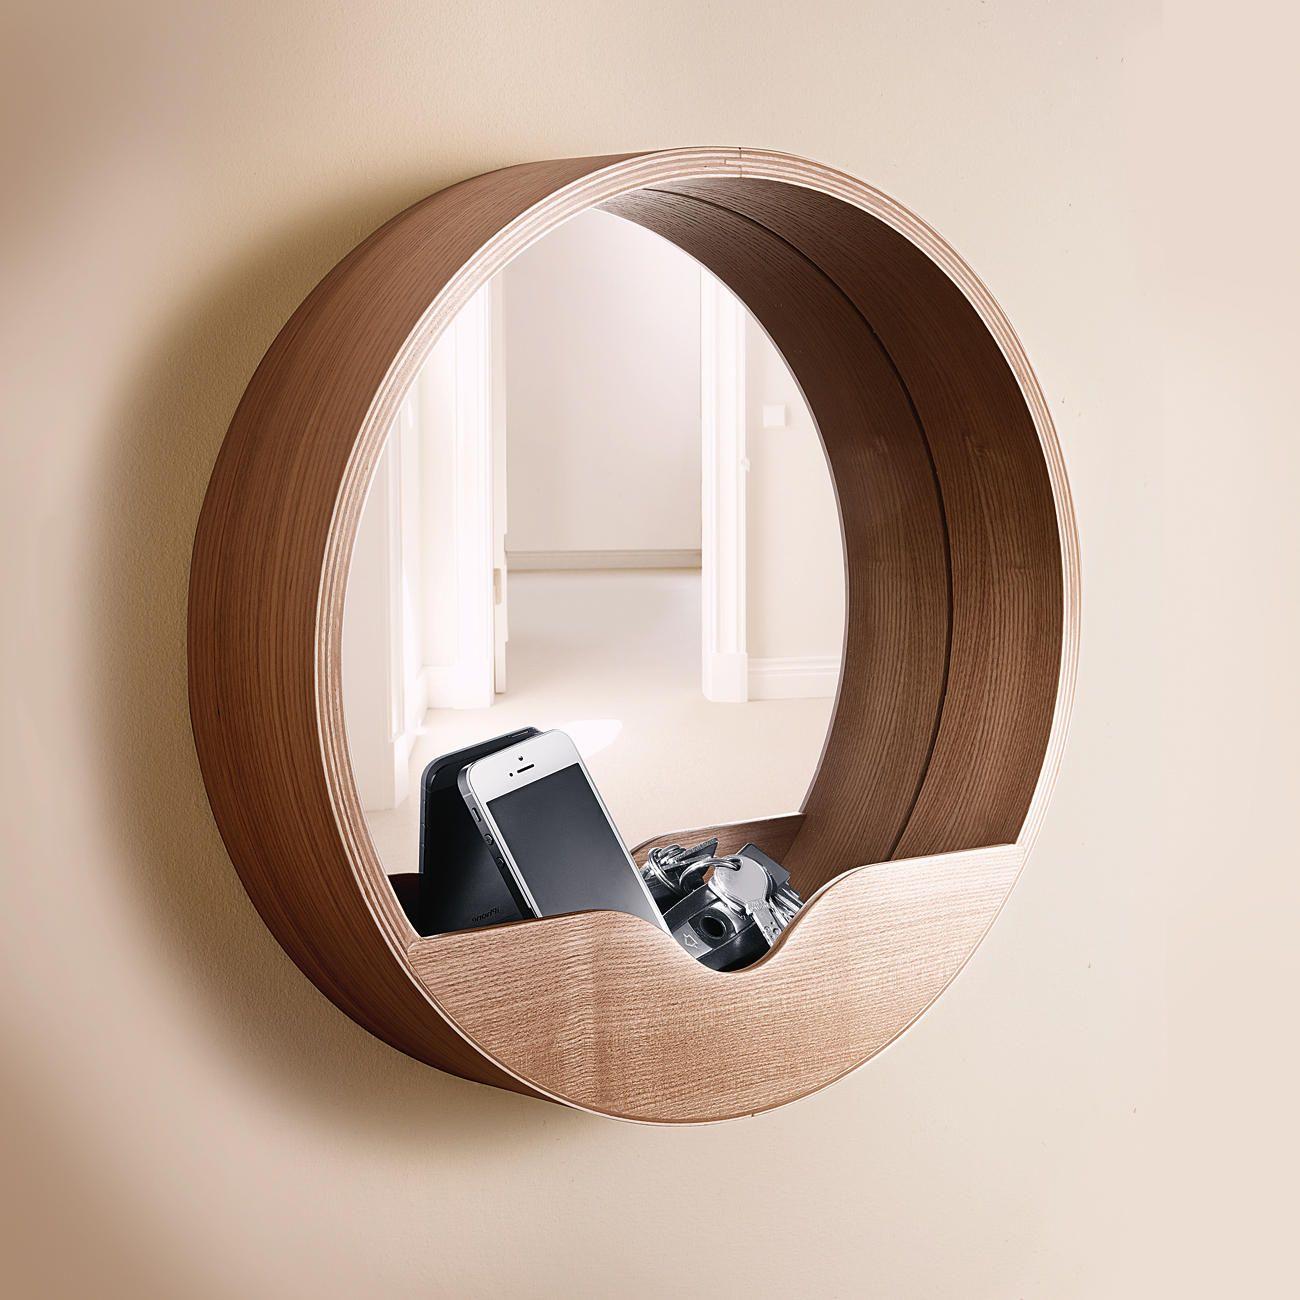 Hallway mirror kmart   Beautiful Wall Mirror Designs  Walls Articles and Oak veneer